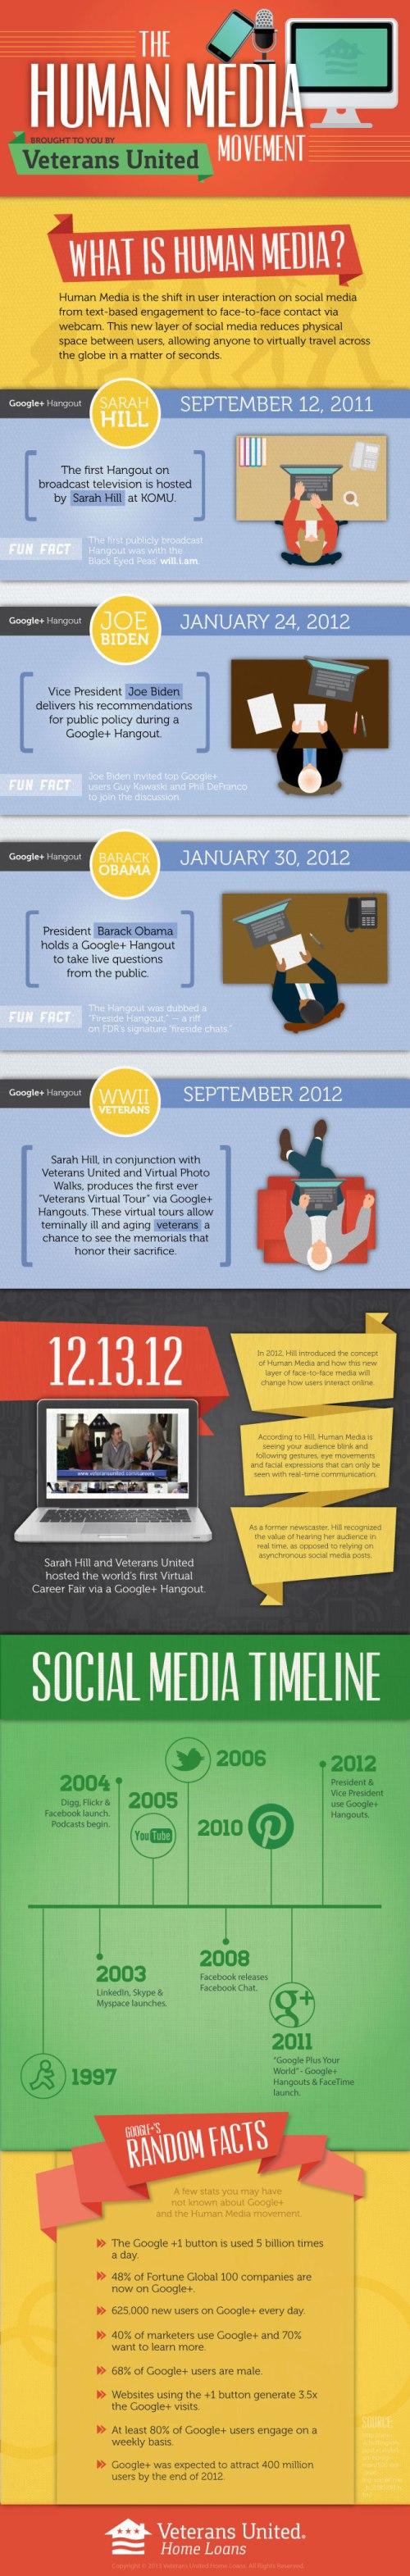 infographic_humanmedia